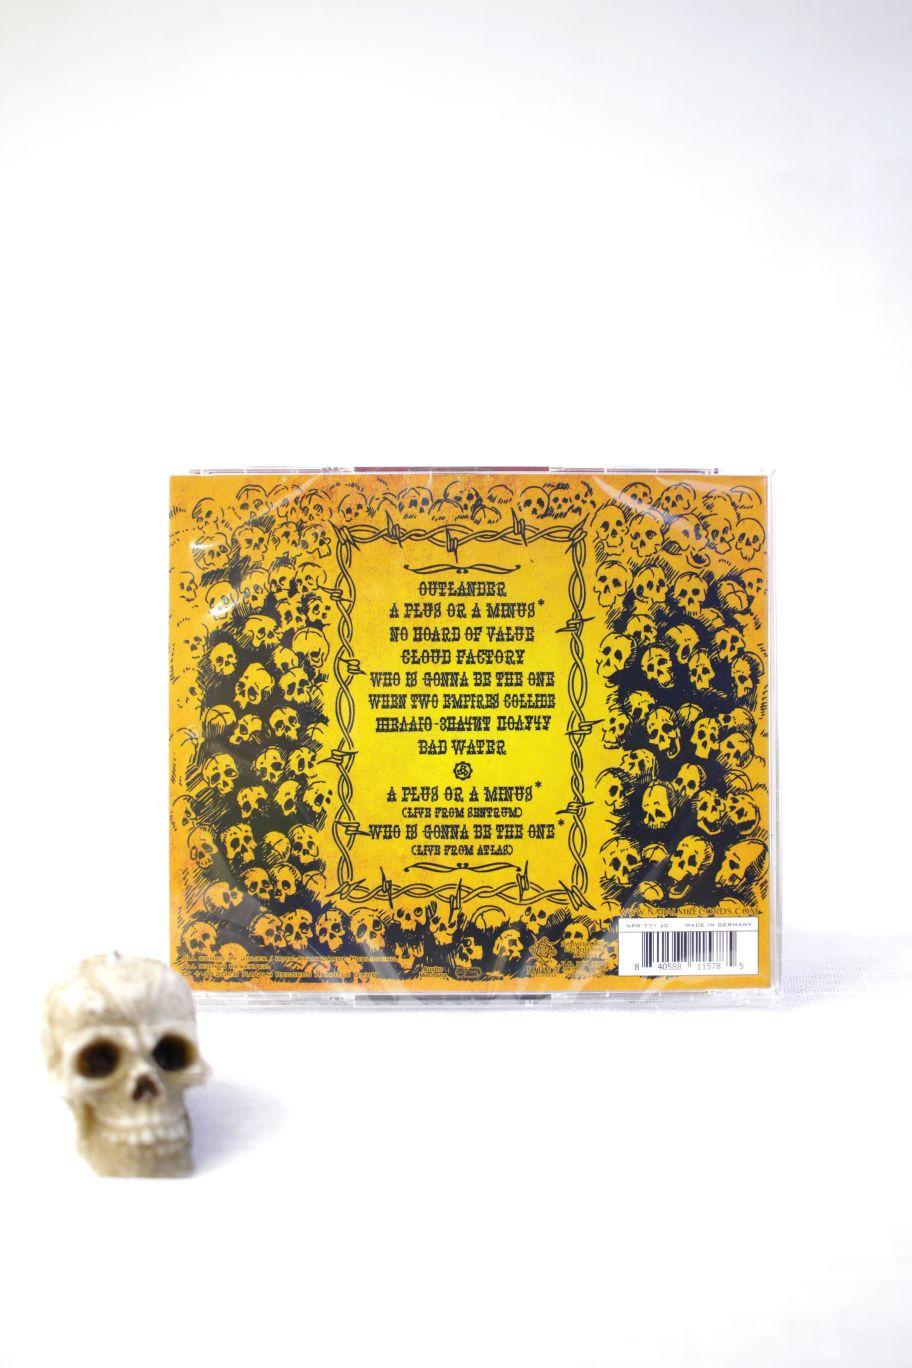 CD JINJER CLOUD FACTORY REISSUE